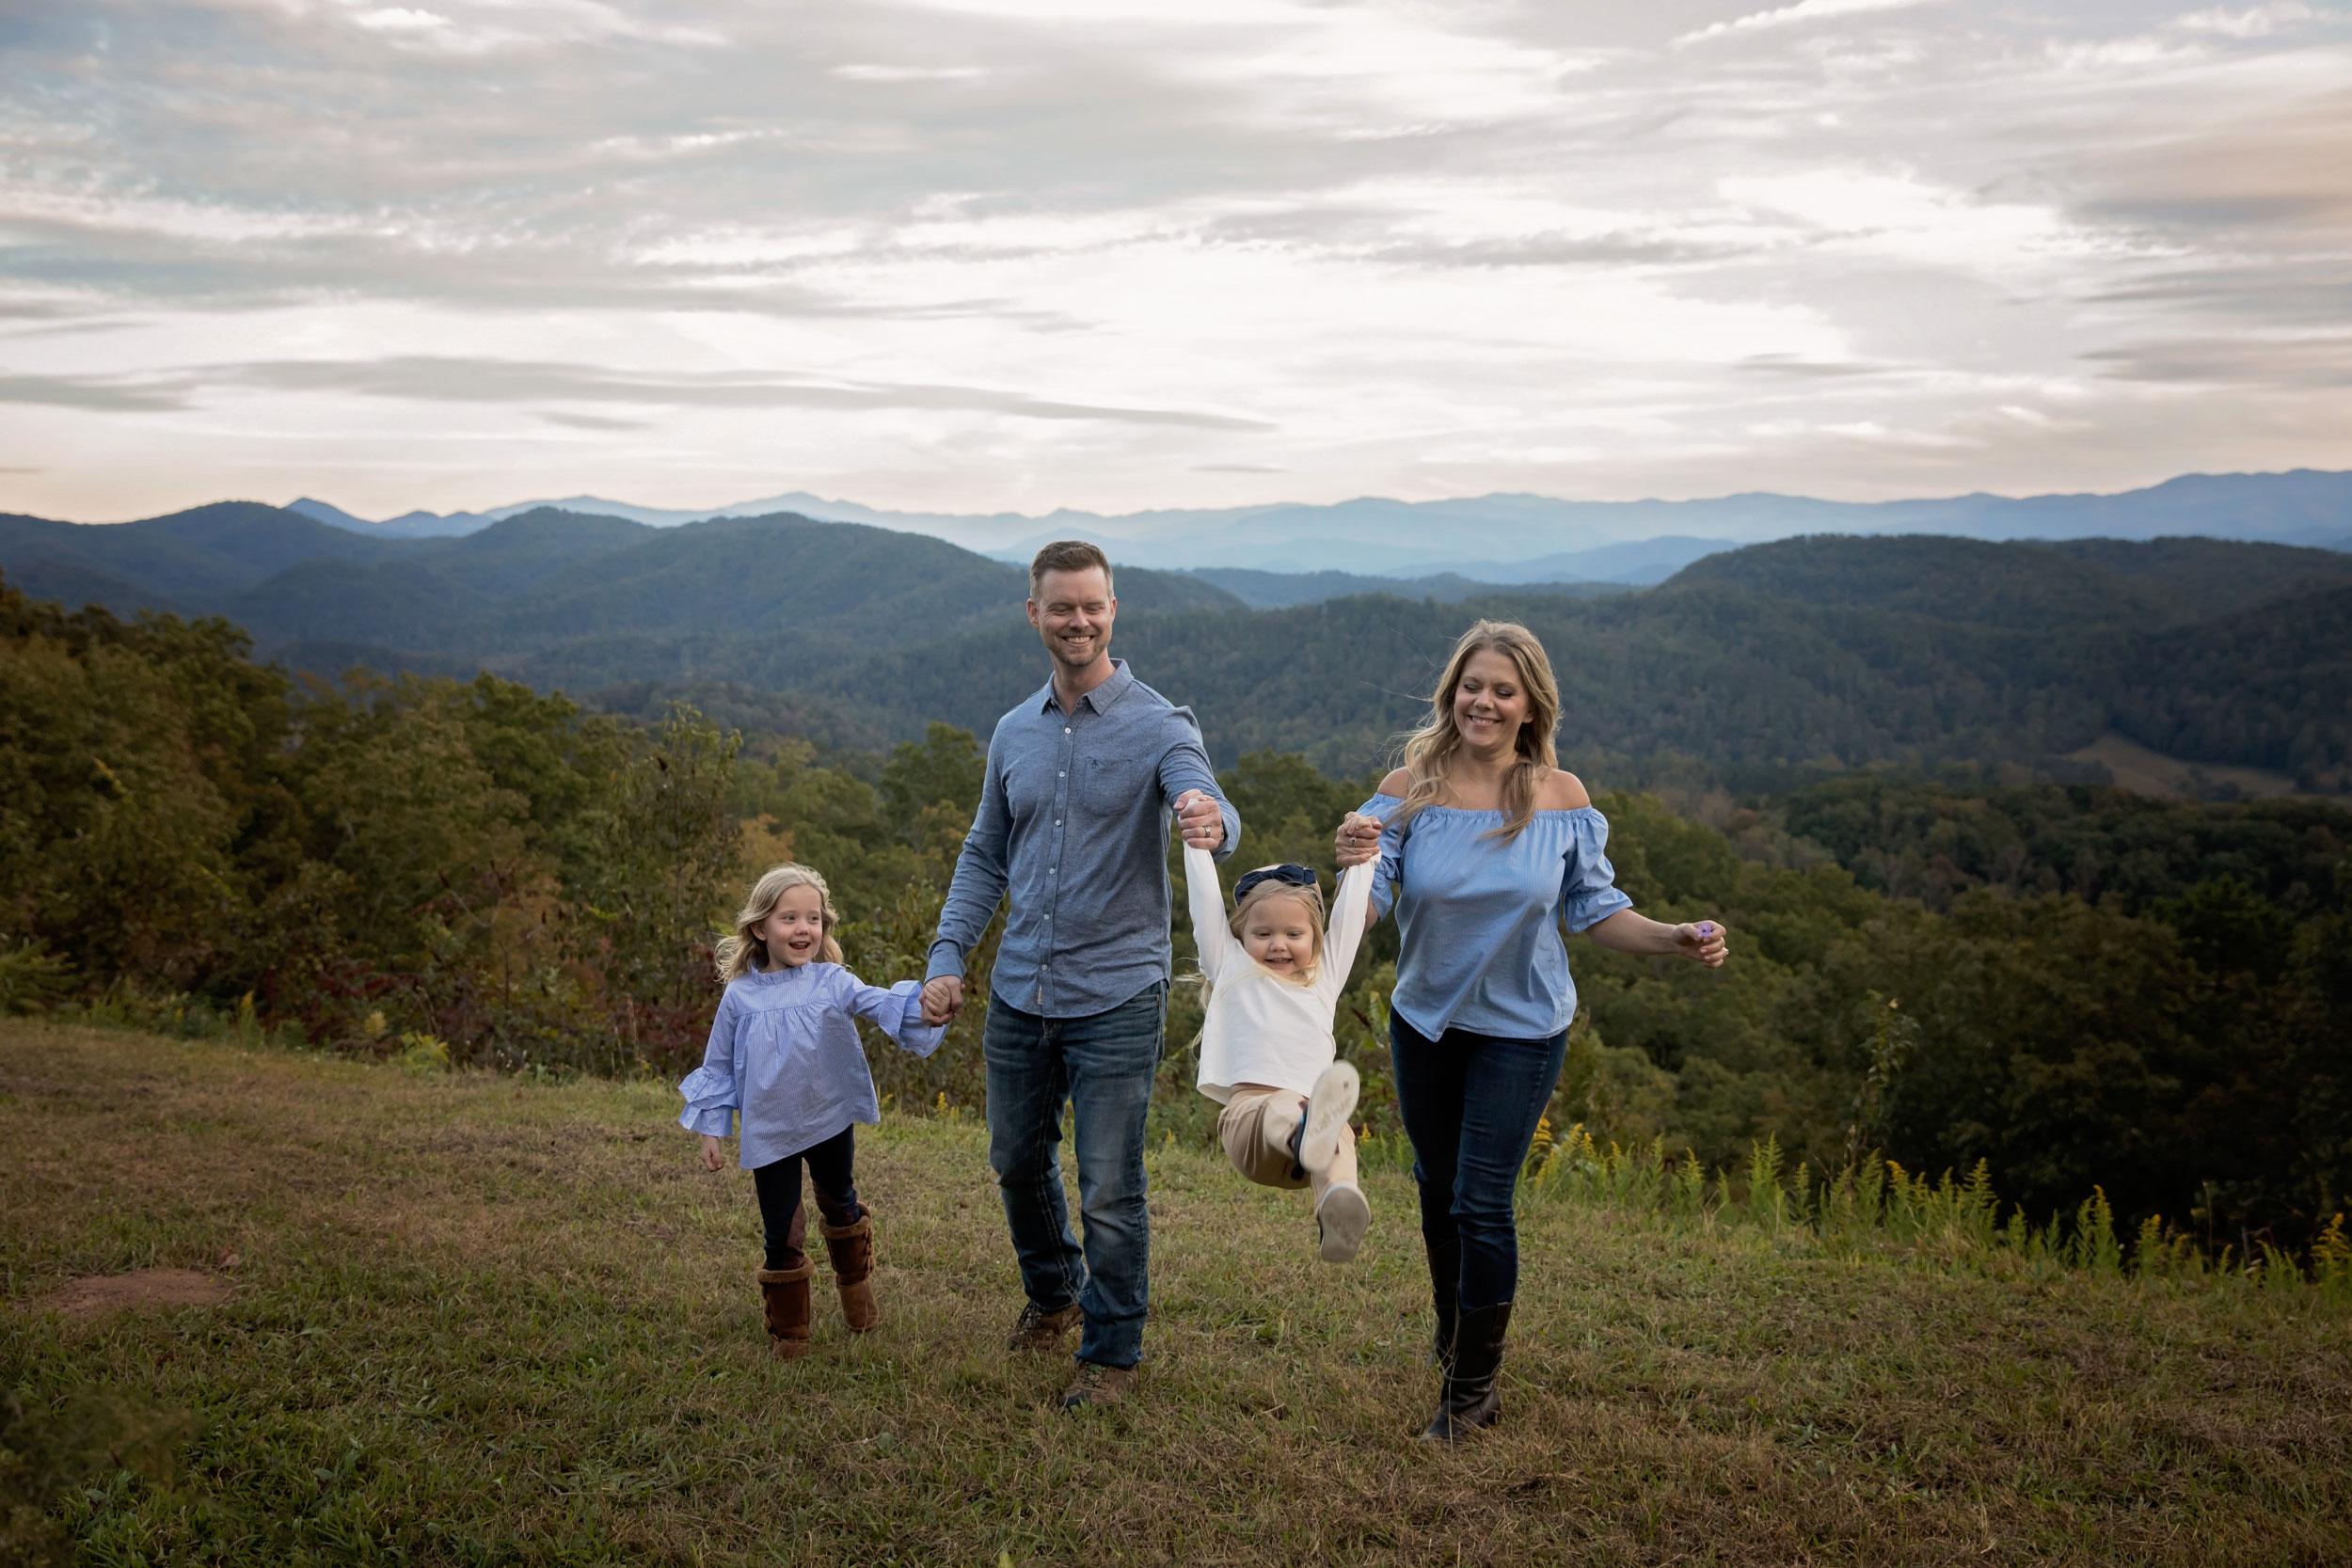 gatlinburg-photographer-smoky-mountain-family-vacation.jpg